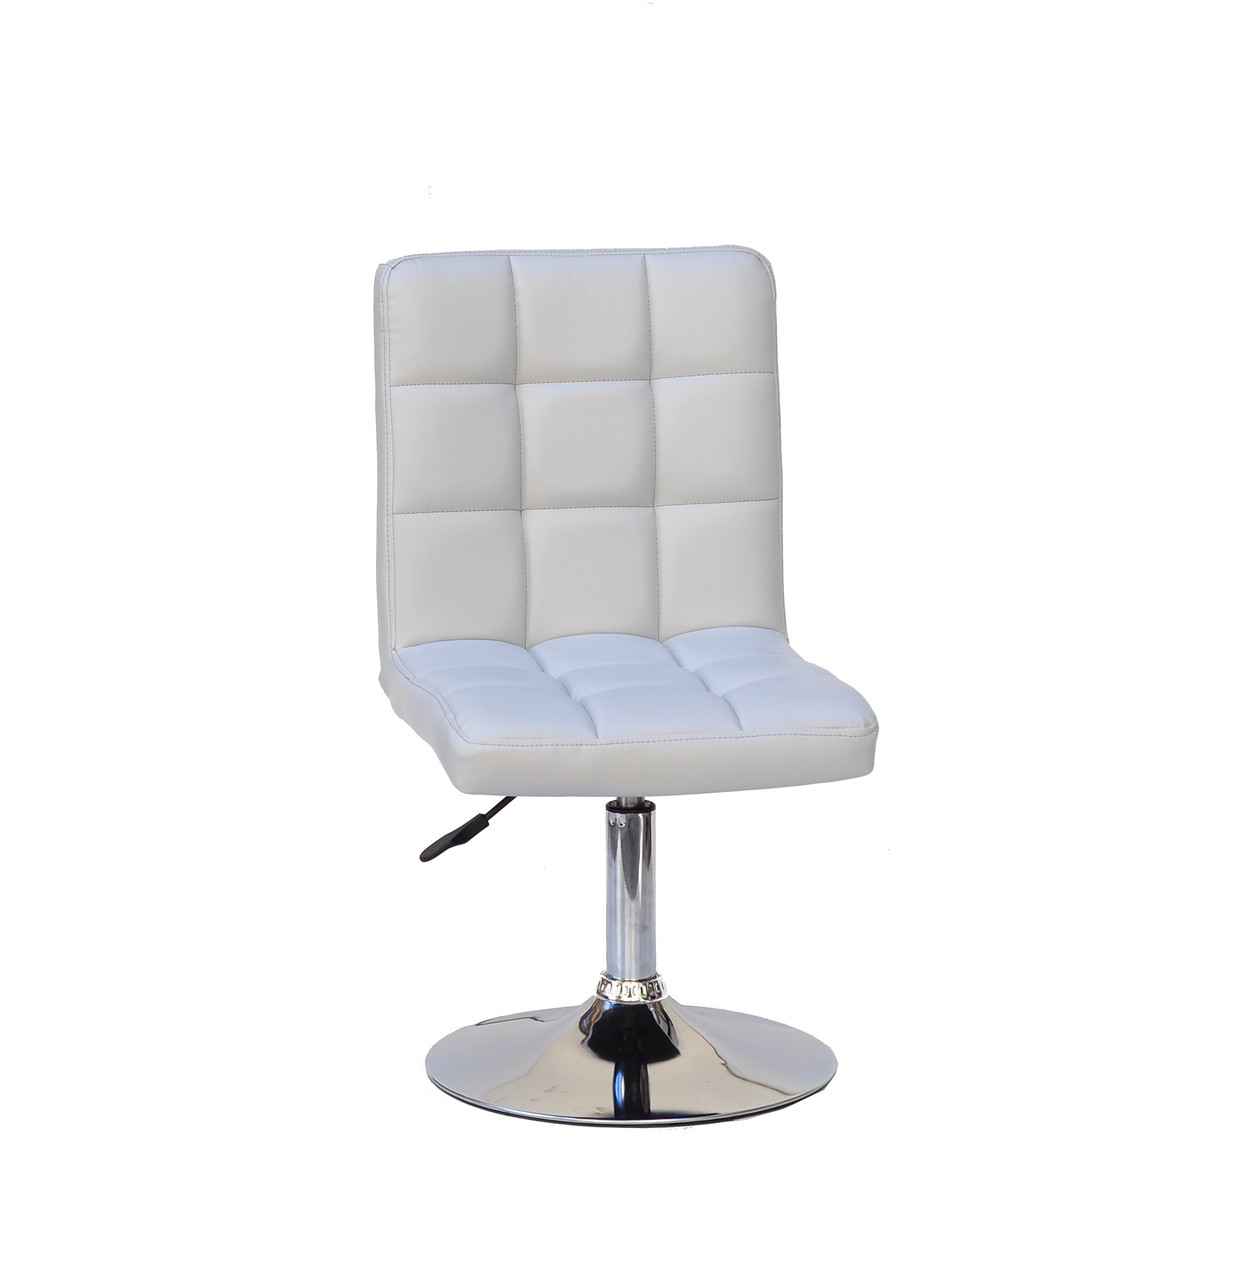 Кресло Augusto (Августо) CH-BASE светло- серая экокожа на блине